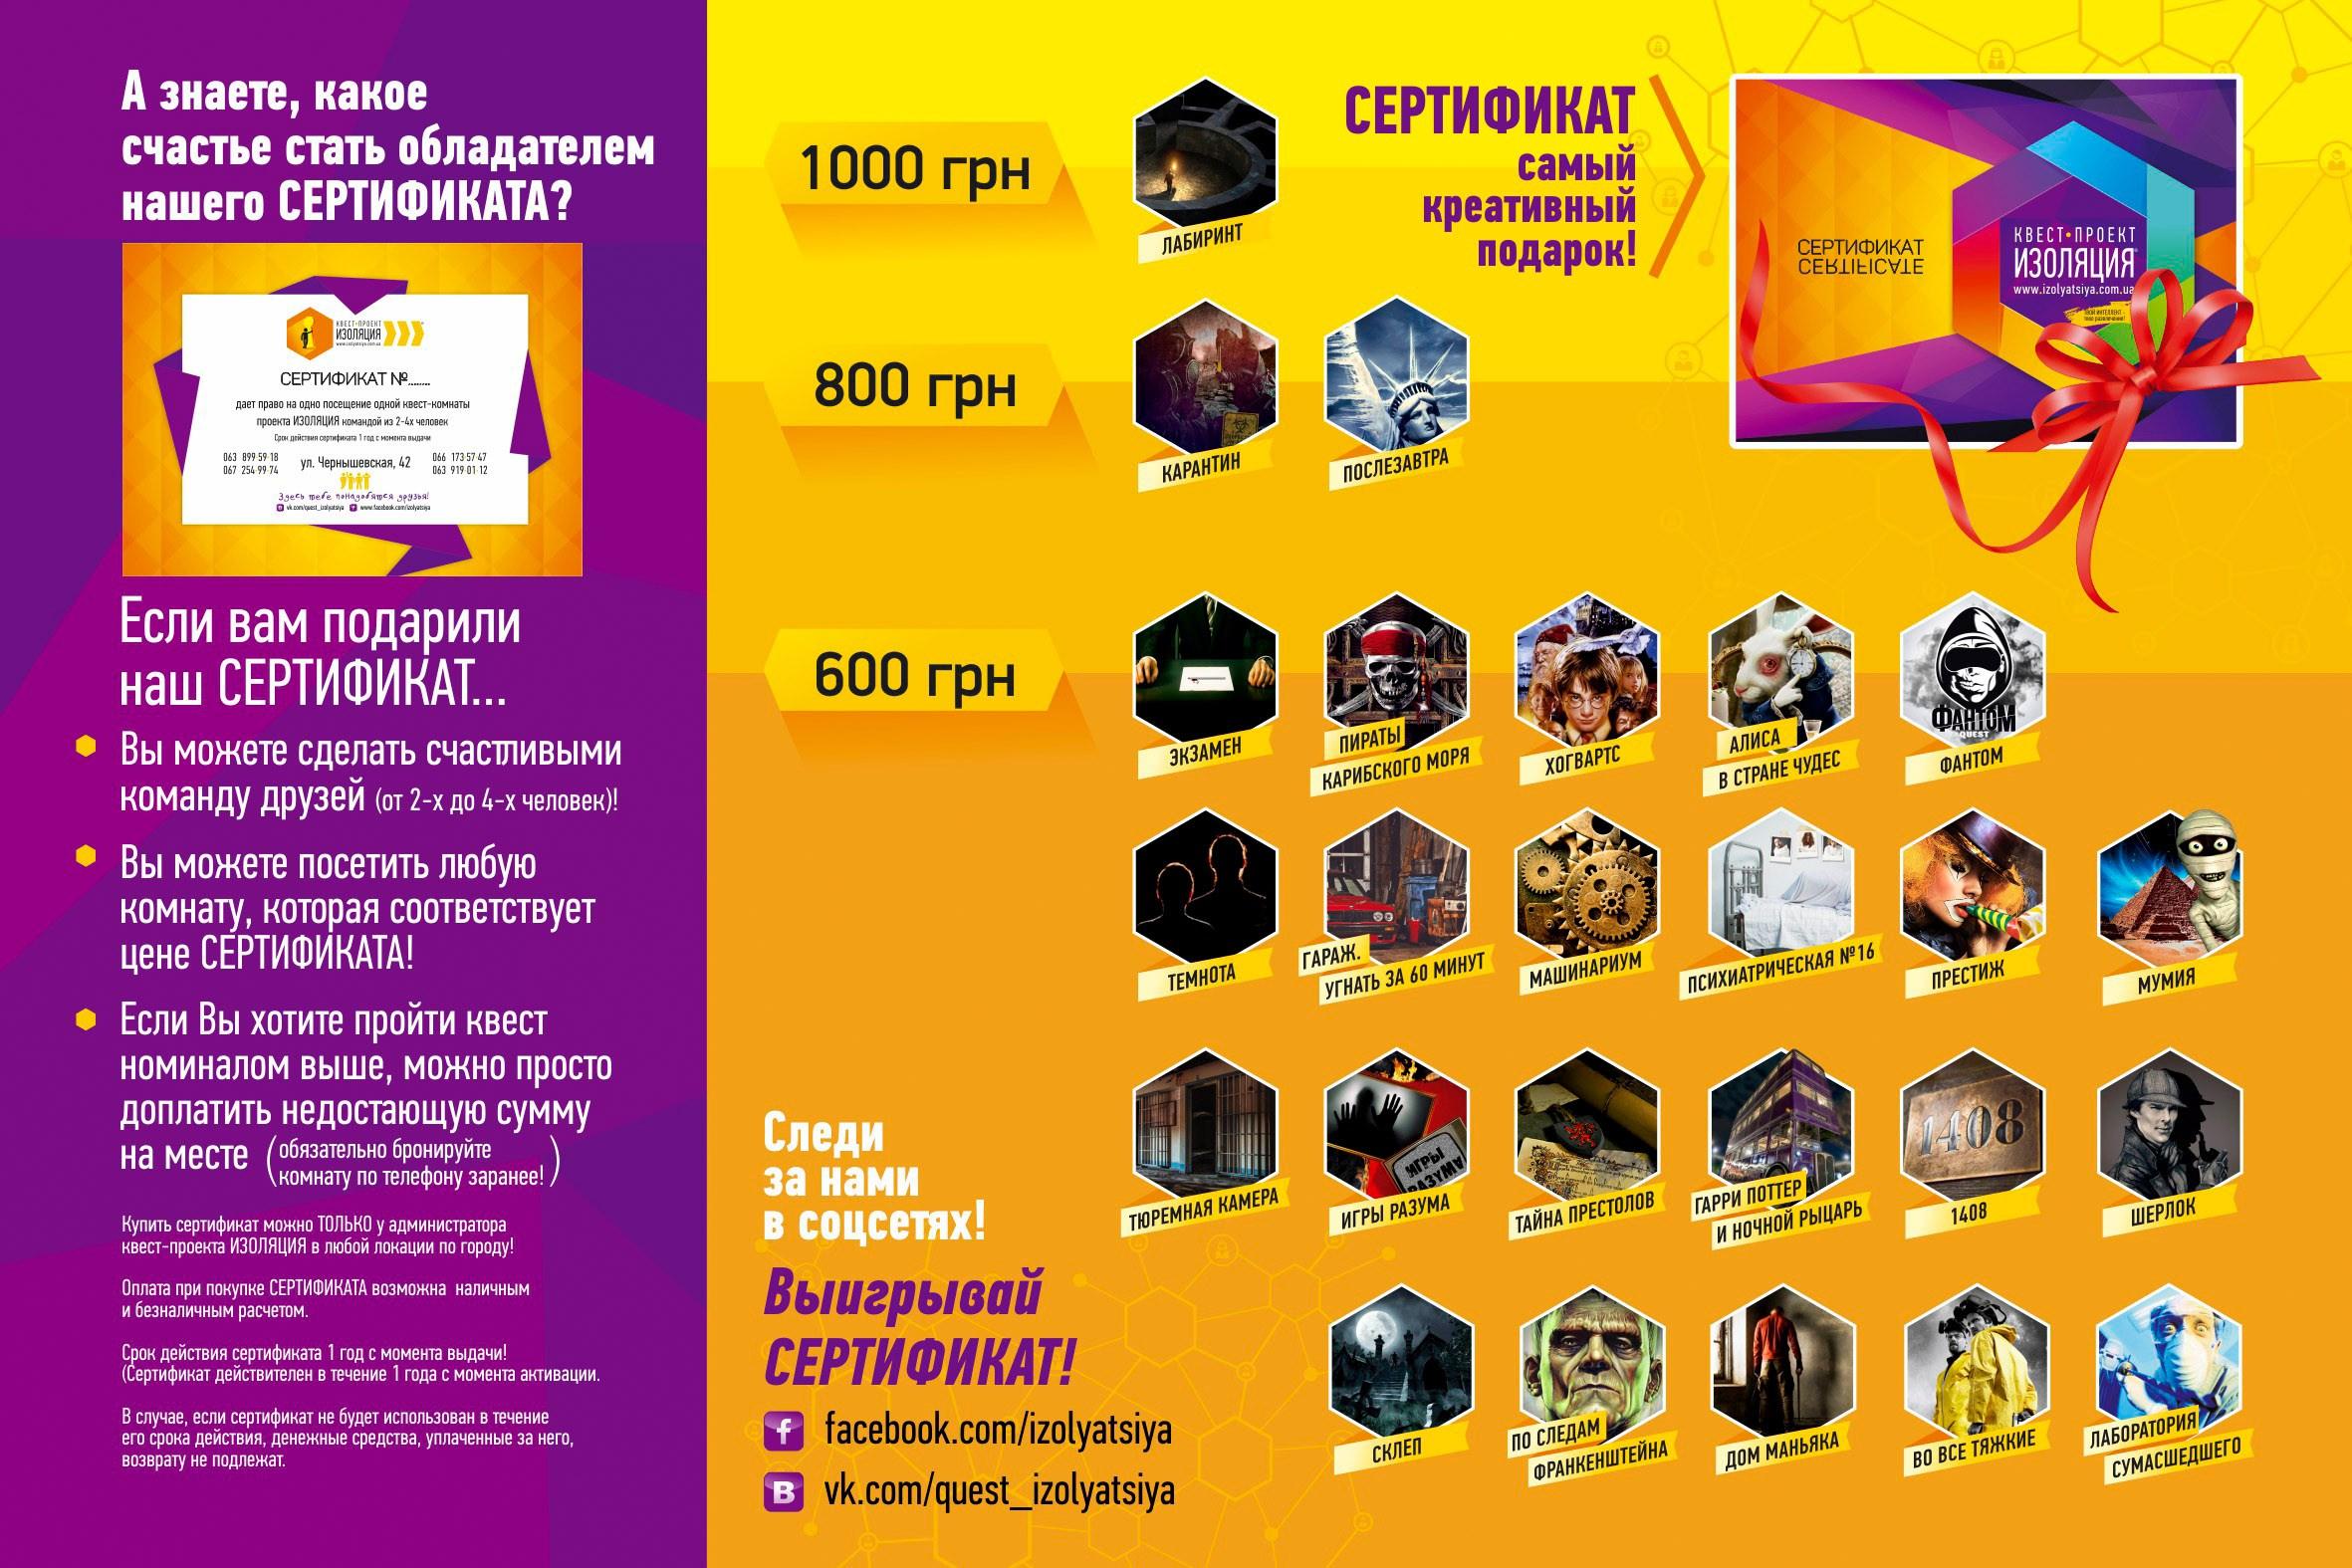 9AEA69D3CF1D999A5340E93C309886FAE101C6726137F290DCpimgpsh_fullsize_distr Сертифікат